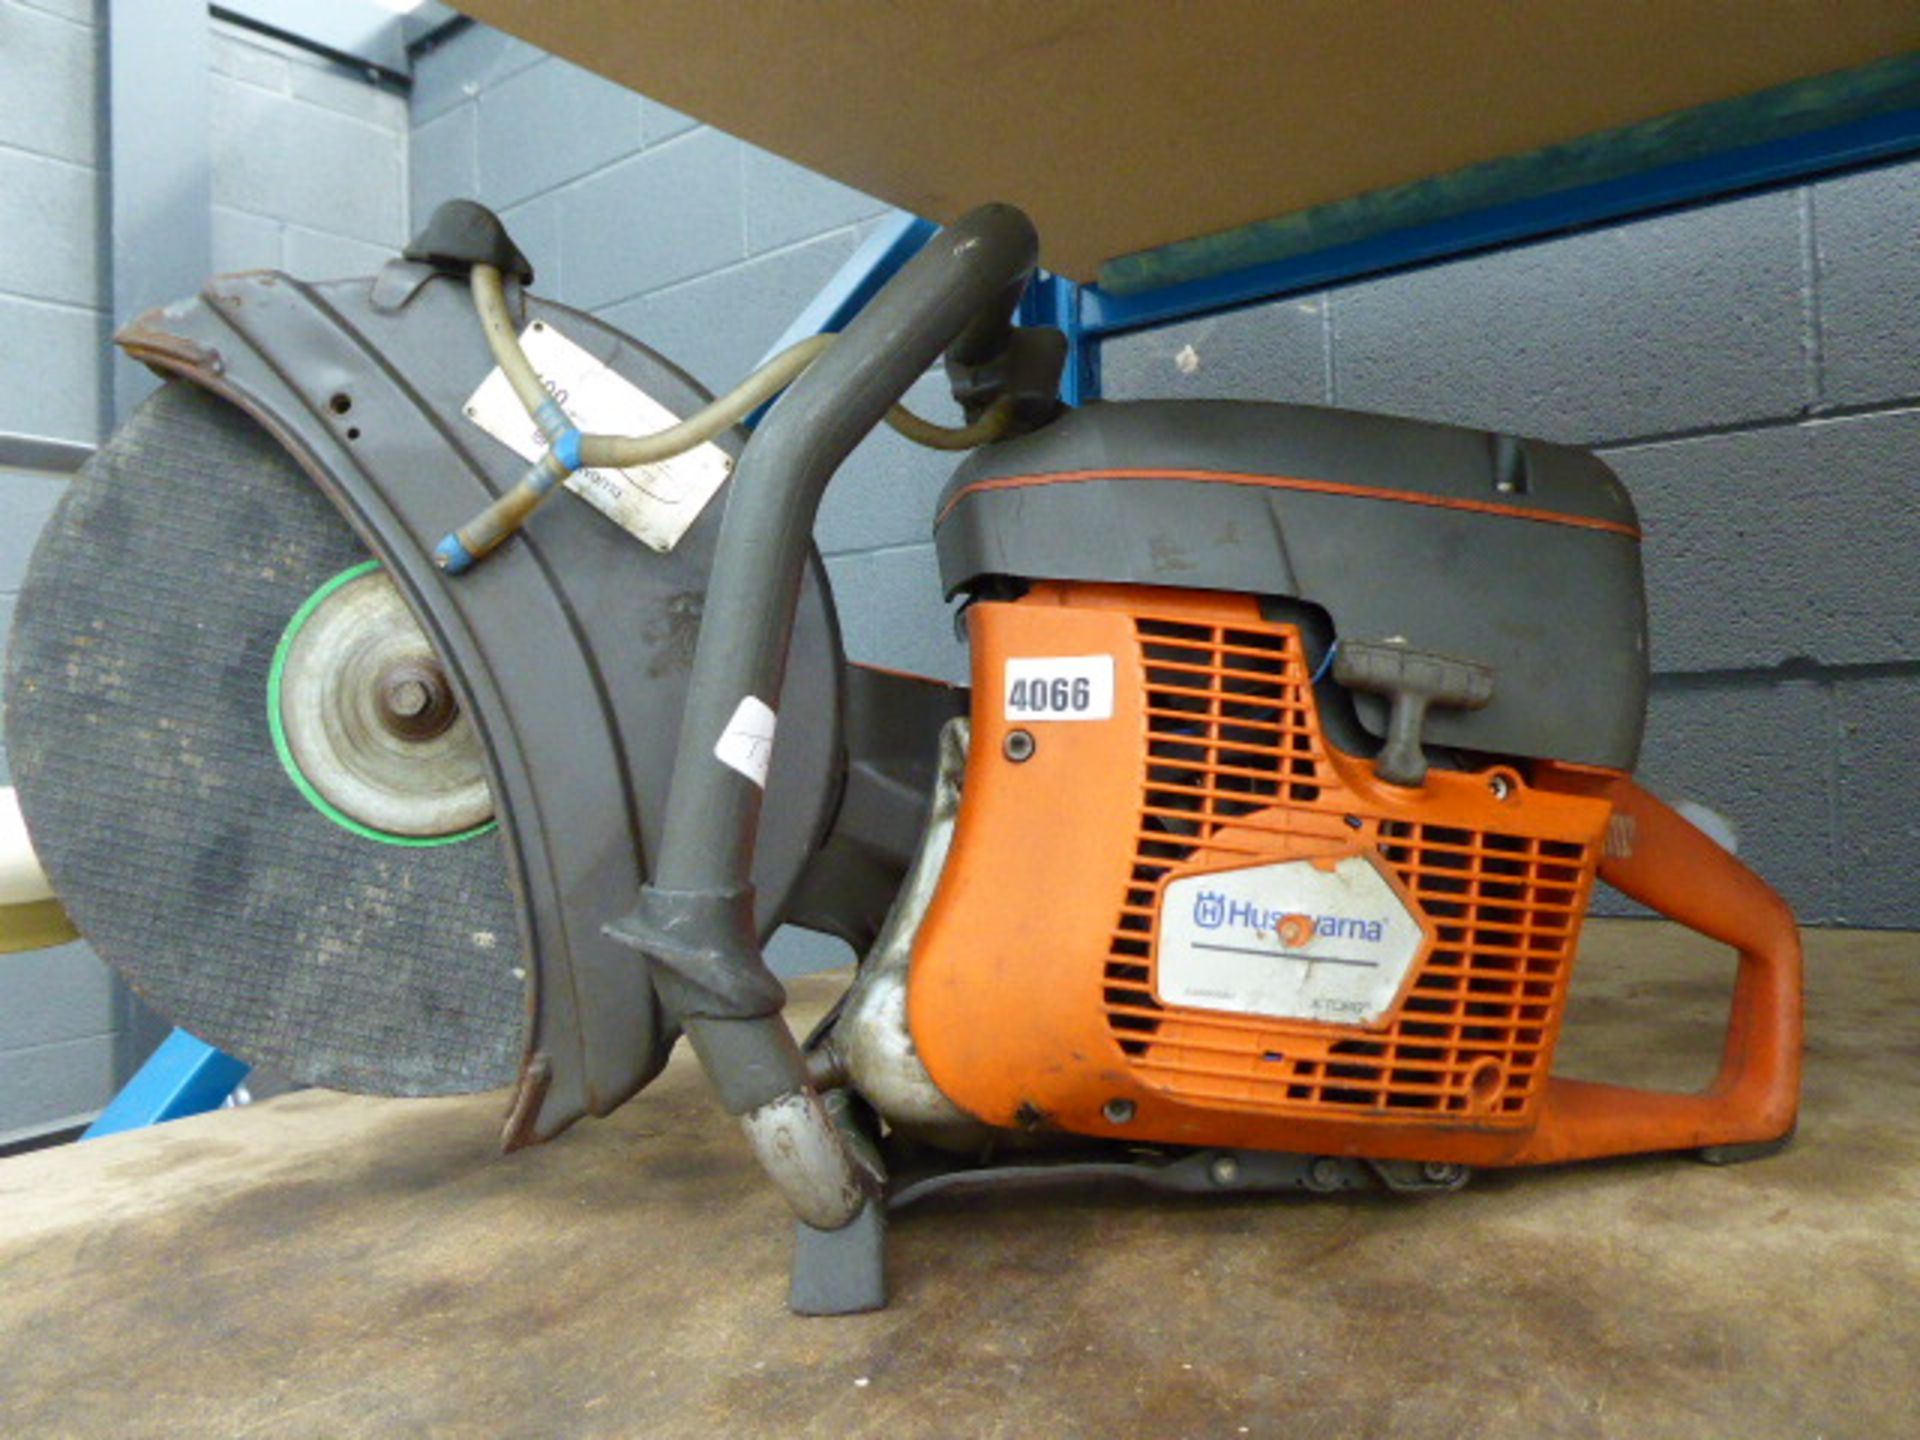 Lot 4066 - Husqvana 12'' petrol powered disc cutter